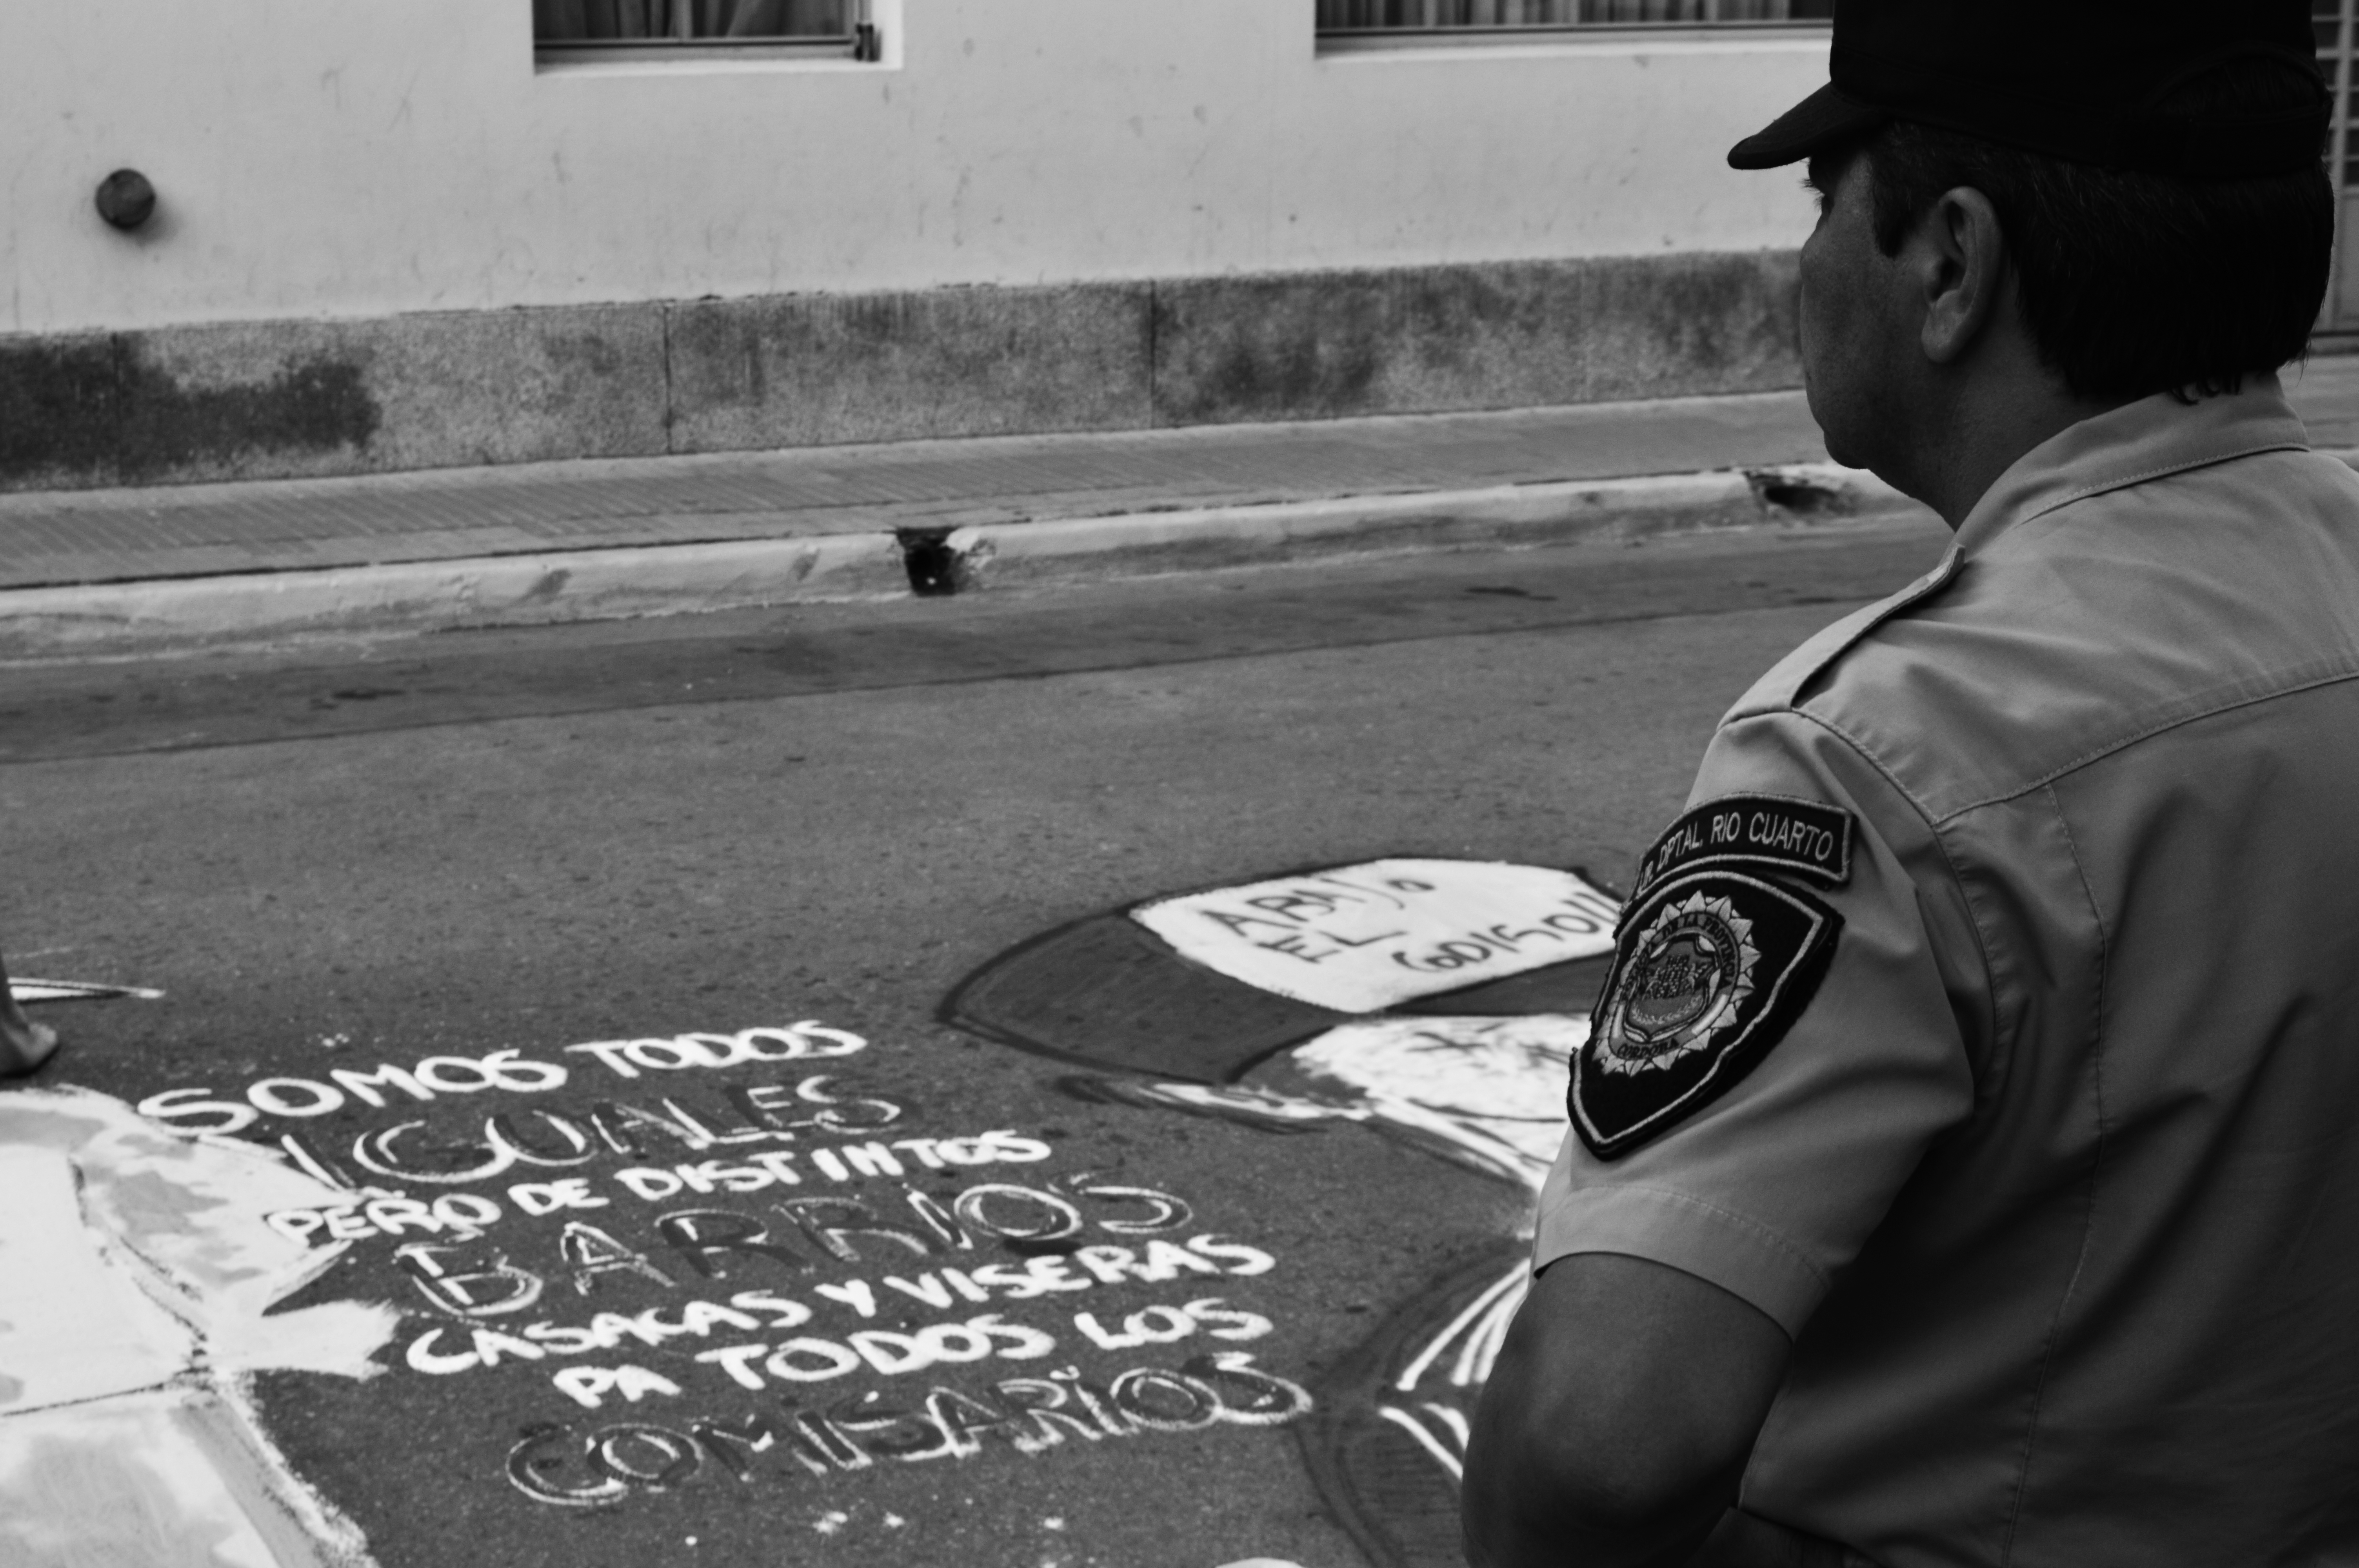 File:Marcha de la gorra 2014 en Río Cuarto - Córdoba 02.jpg ...